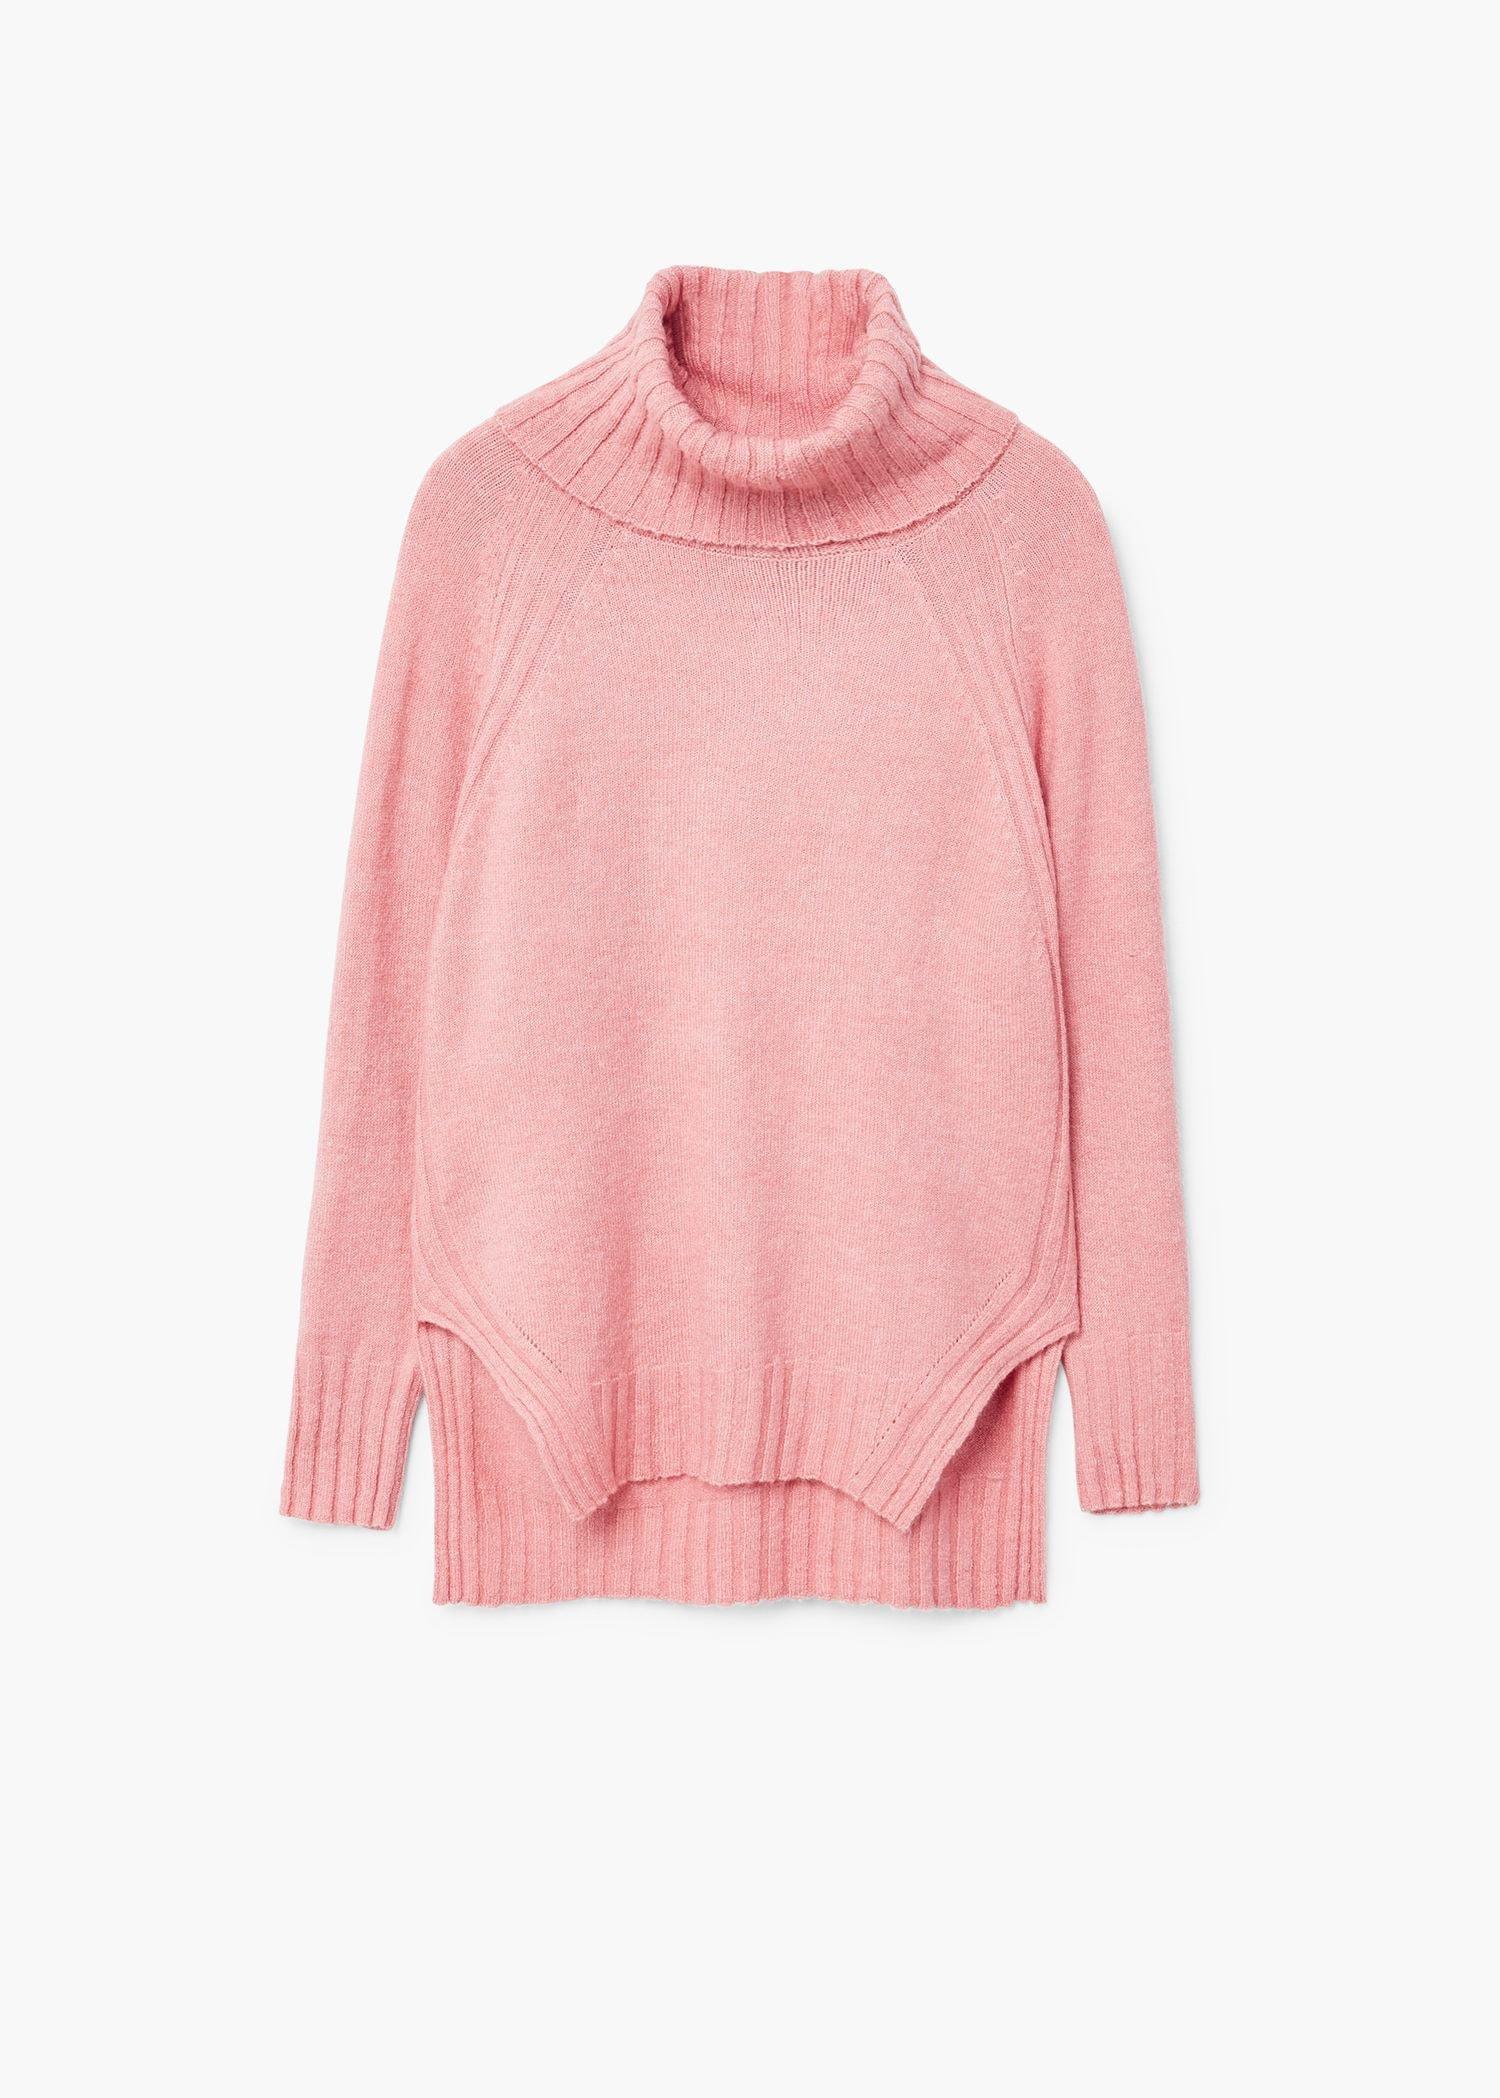 Mango Turtleneck Sweater in Pink | Lyst